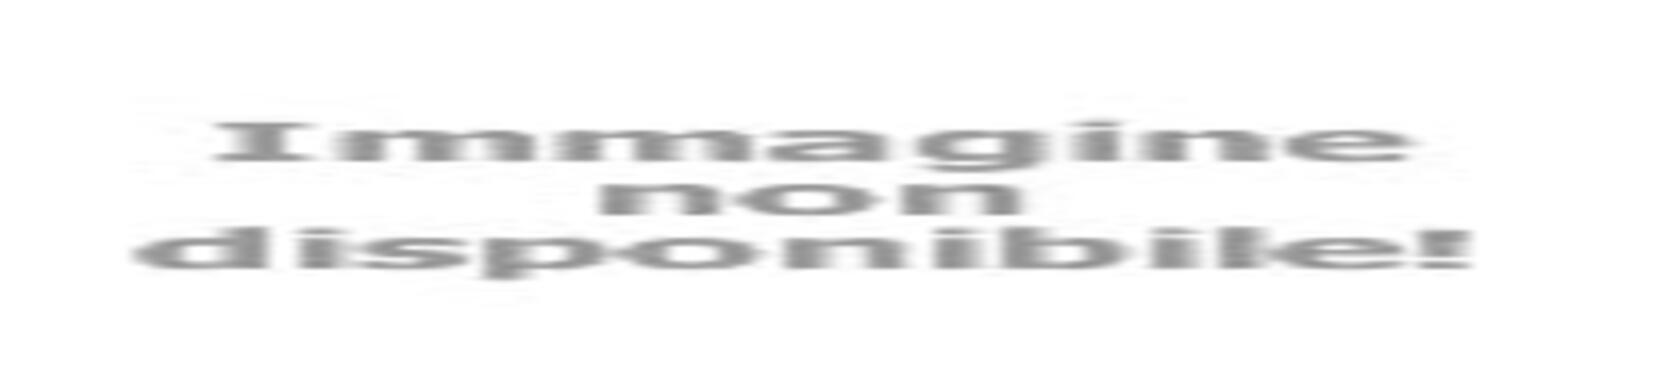 basketriminicrabs it 6-1077-video-ceccarules-n.17 005